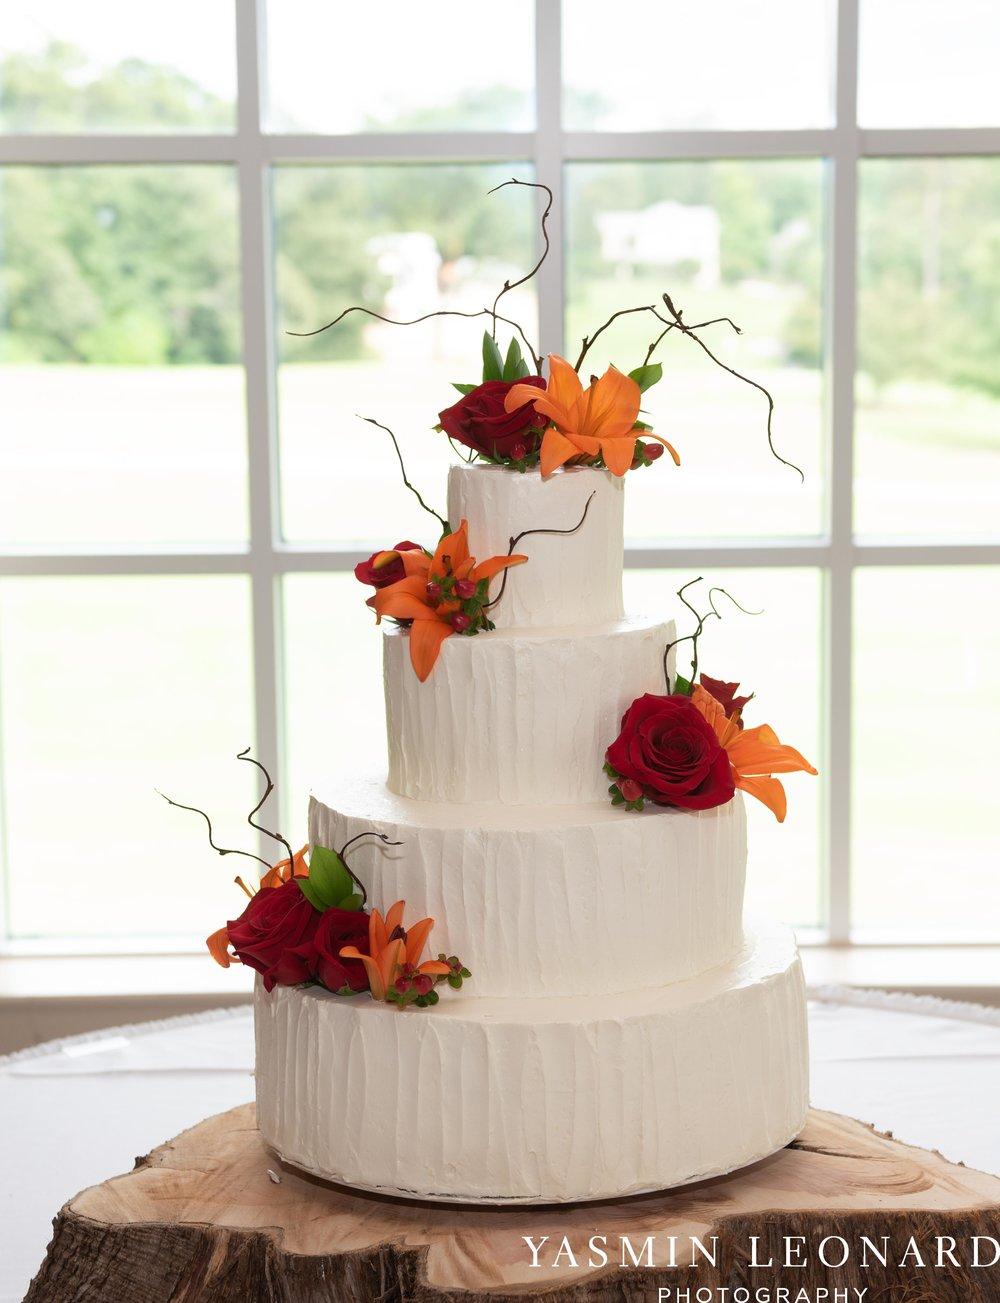 High Point Country Club - Orange and Red Wedding - Country Wedding - Cowboy Hat Wedding - Country Club Wedding - High Point NC - Yasmin Leonard Photography-41.jpg